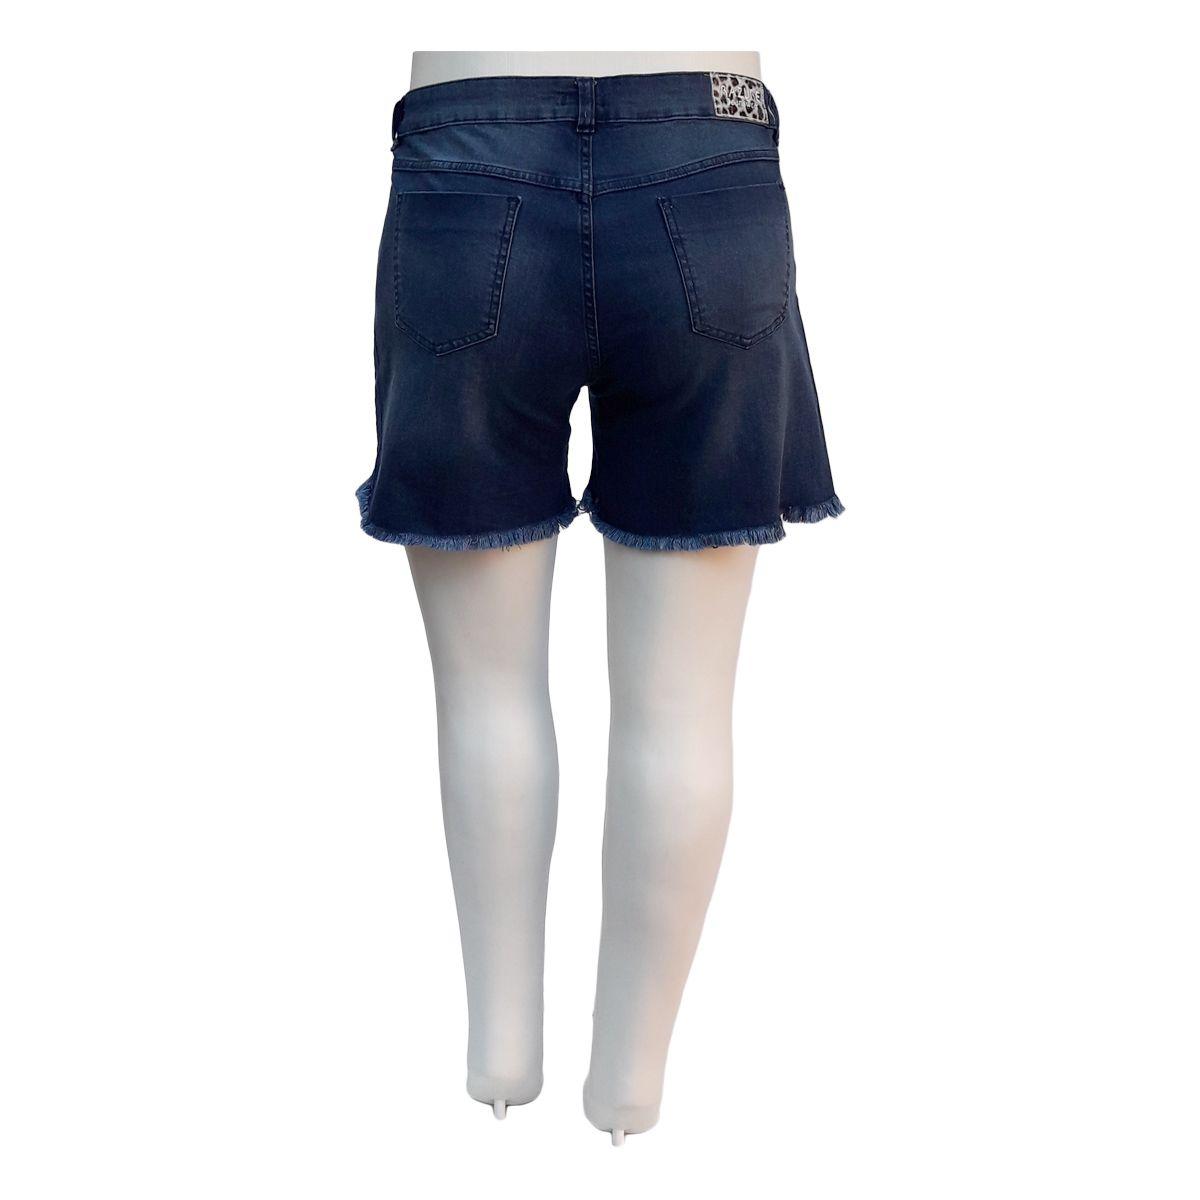 Short Jeans Feminino Mullet Plus Size